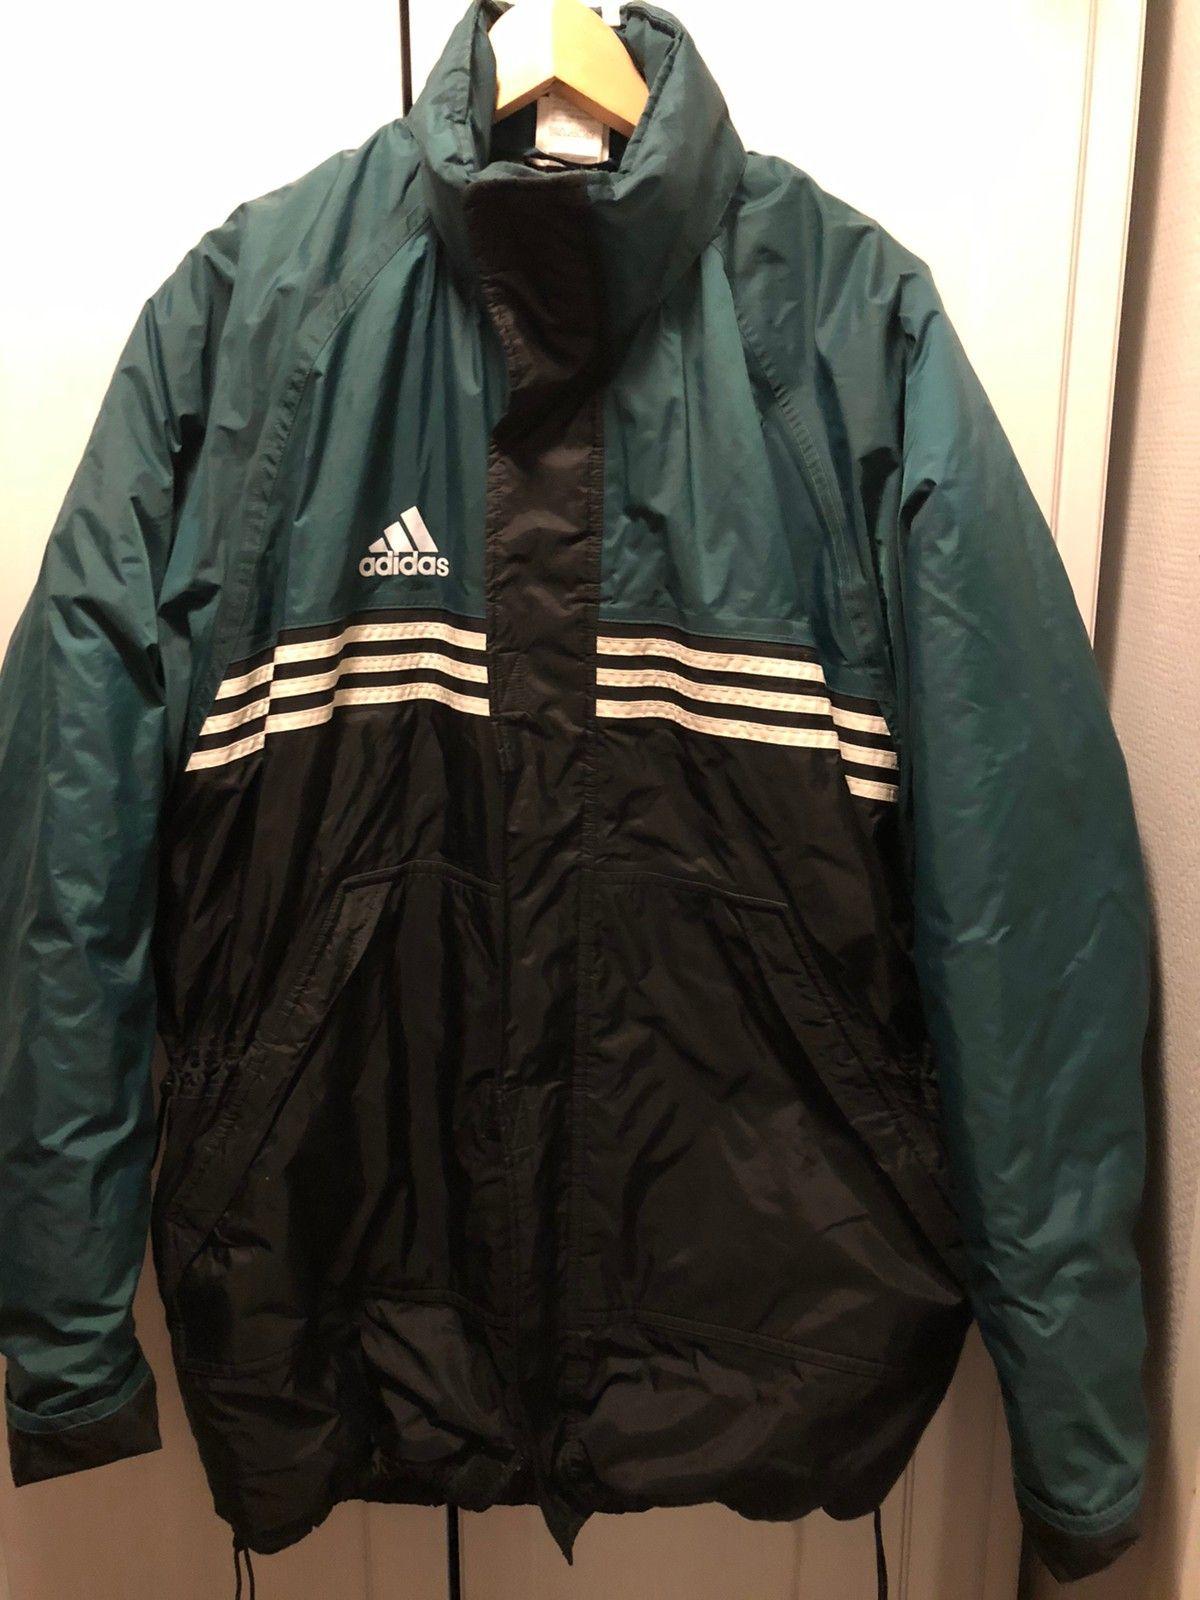 Adidas retro jakke 80 talls. (Nils Arne Eggen, RBK)   FINN.no